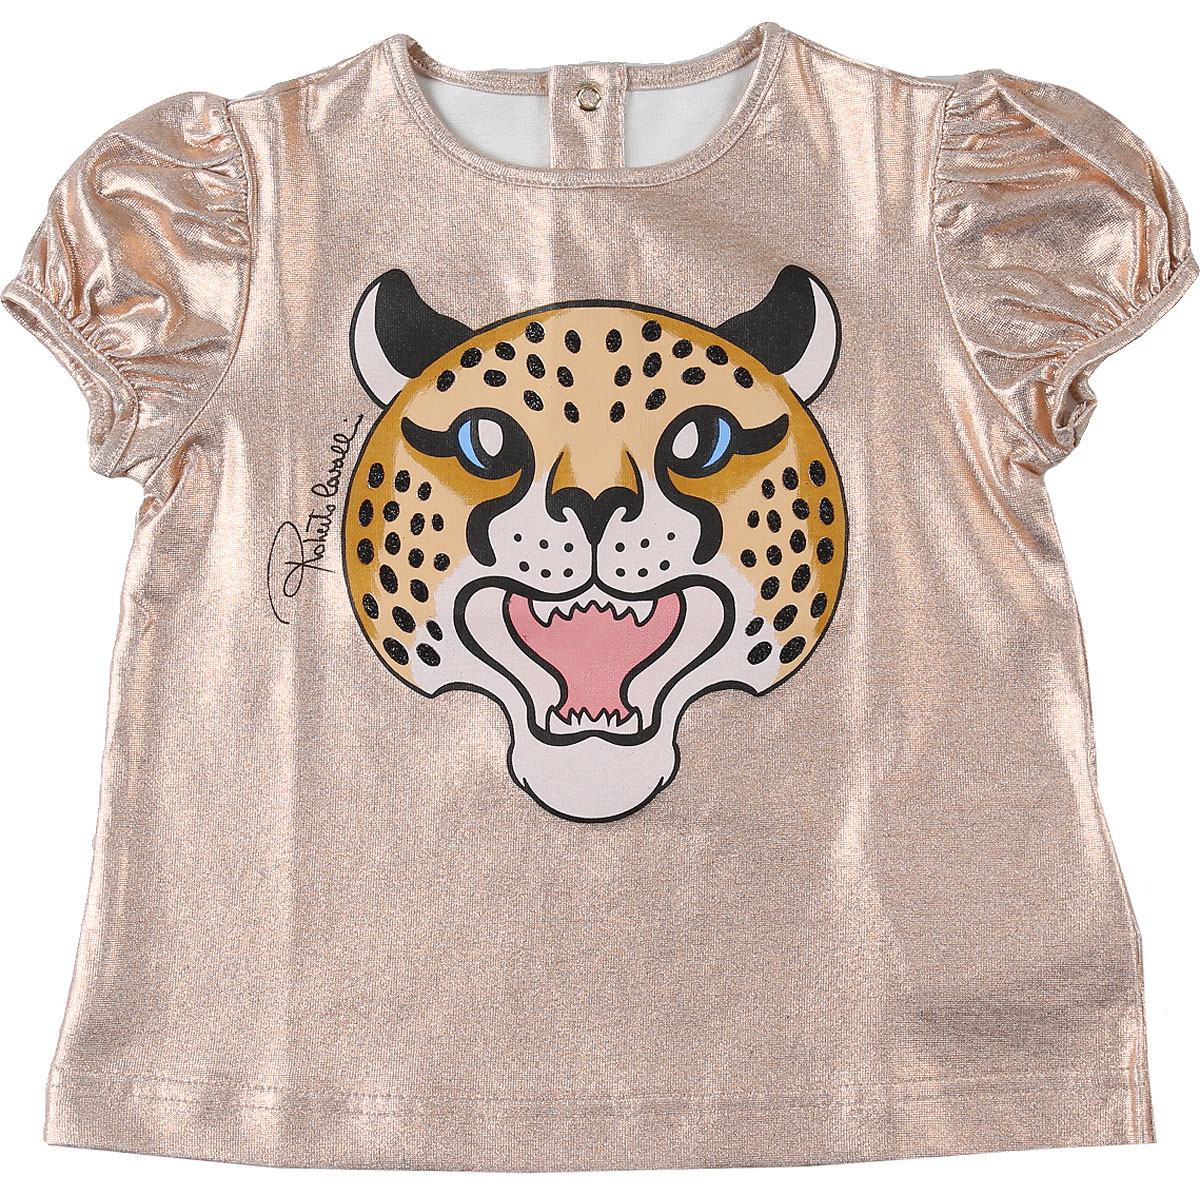 Roberto Cavalli Baby T-Shirt for Girls On Sale, Bronze, Cotton, 2019, 12M 18M 2Y 3Y